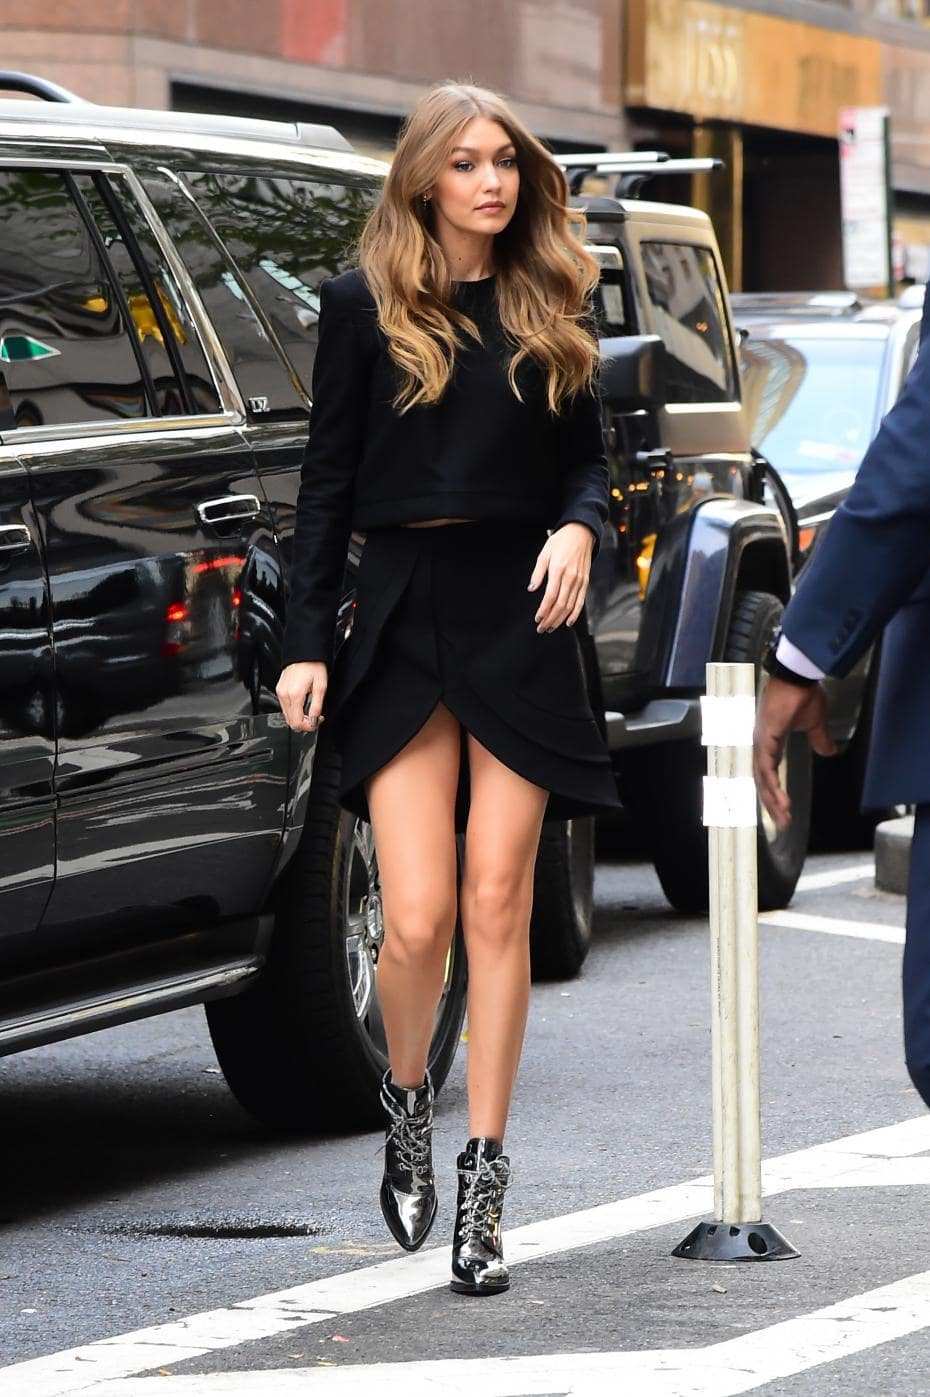 gigi-hadid-top-model-fashion-eleonora-de-gray-runway-magazine TOP MODELS